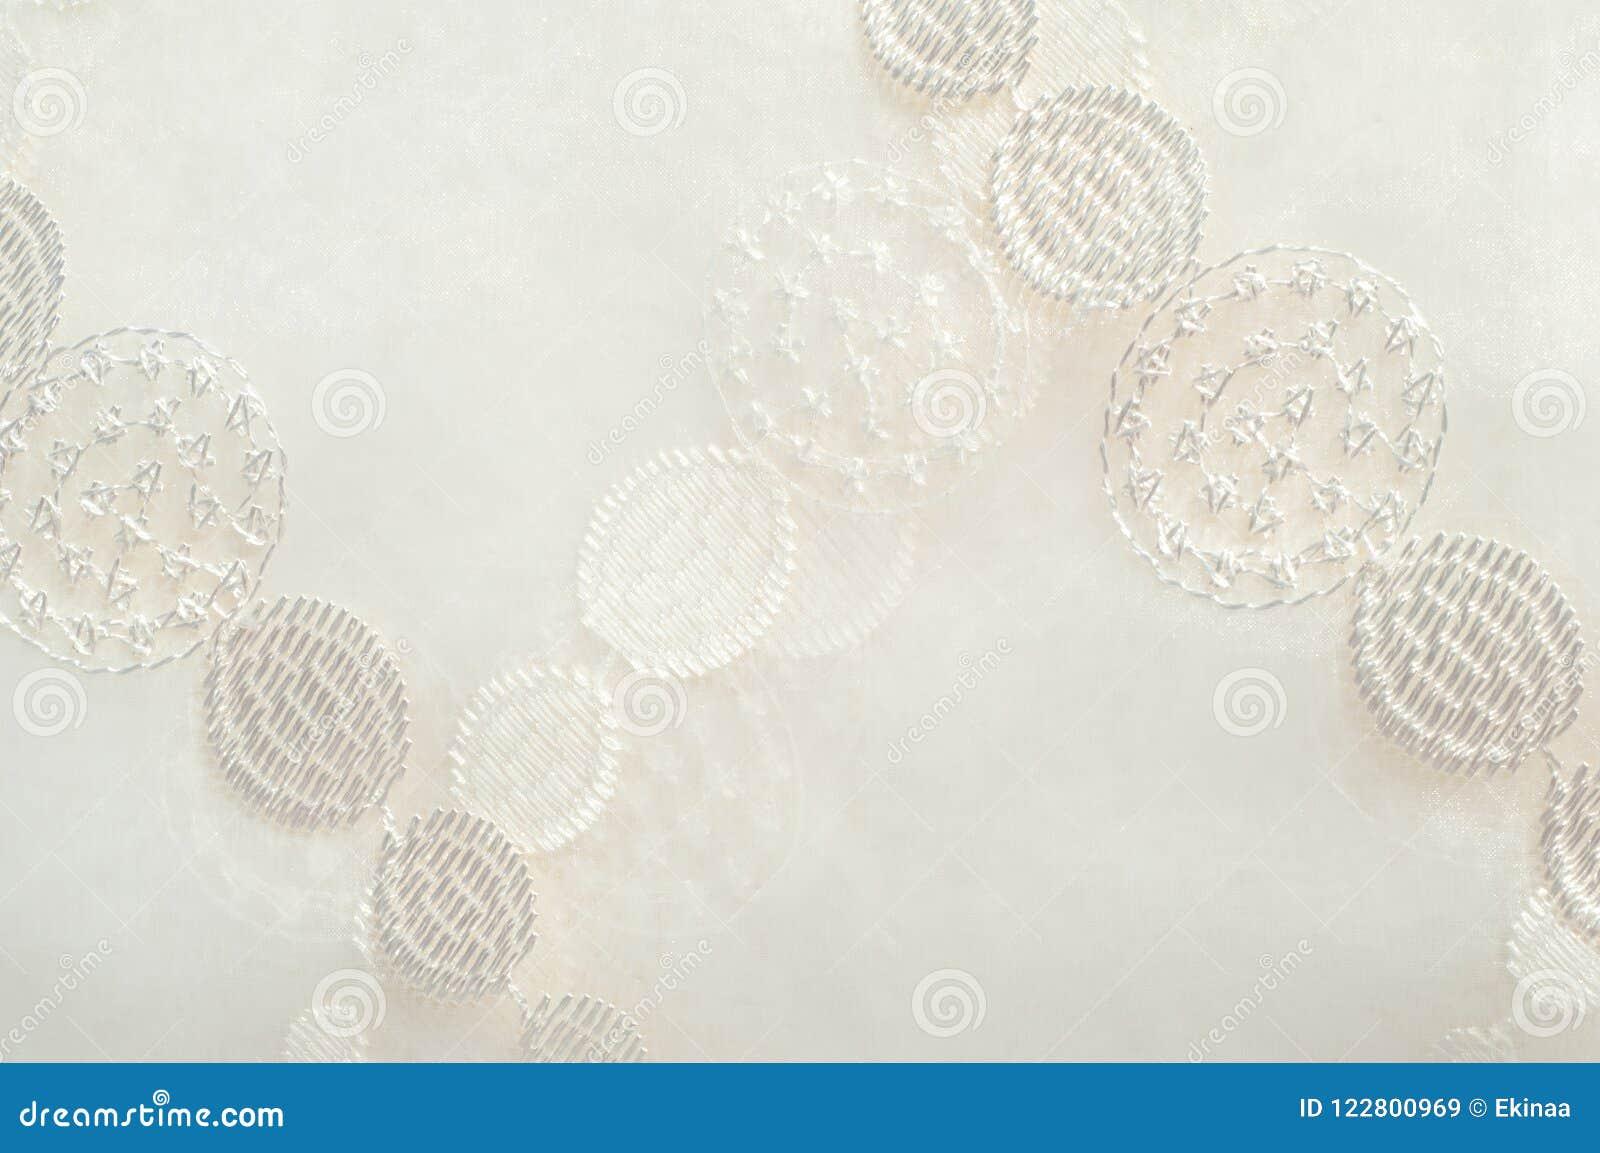 d5abfe654fb6 Texture